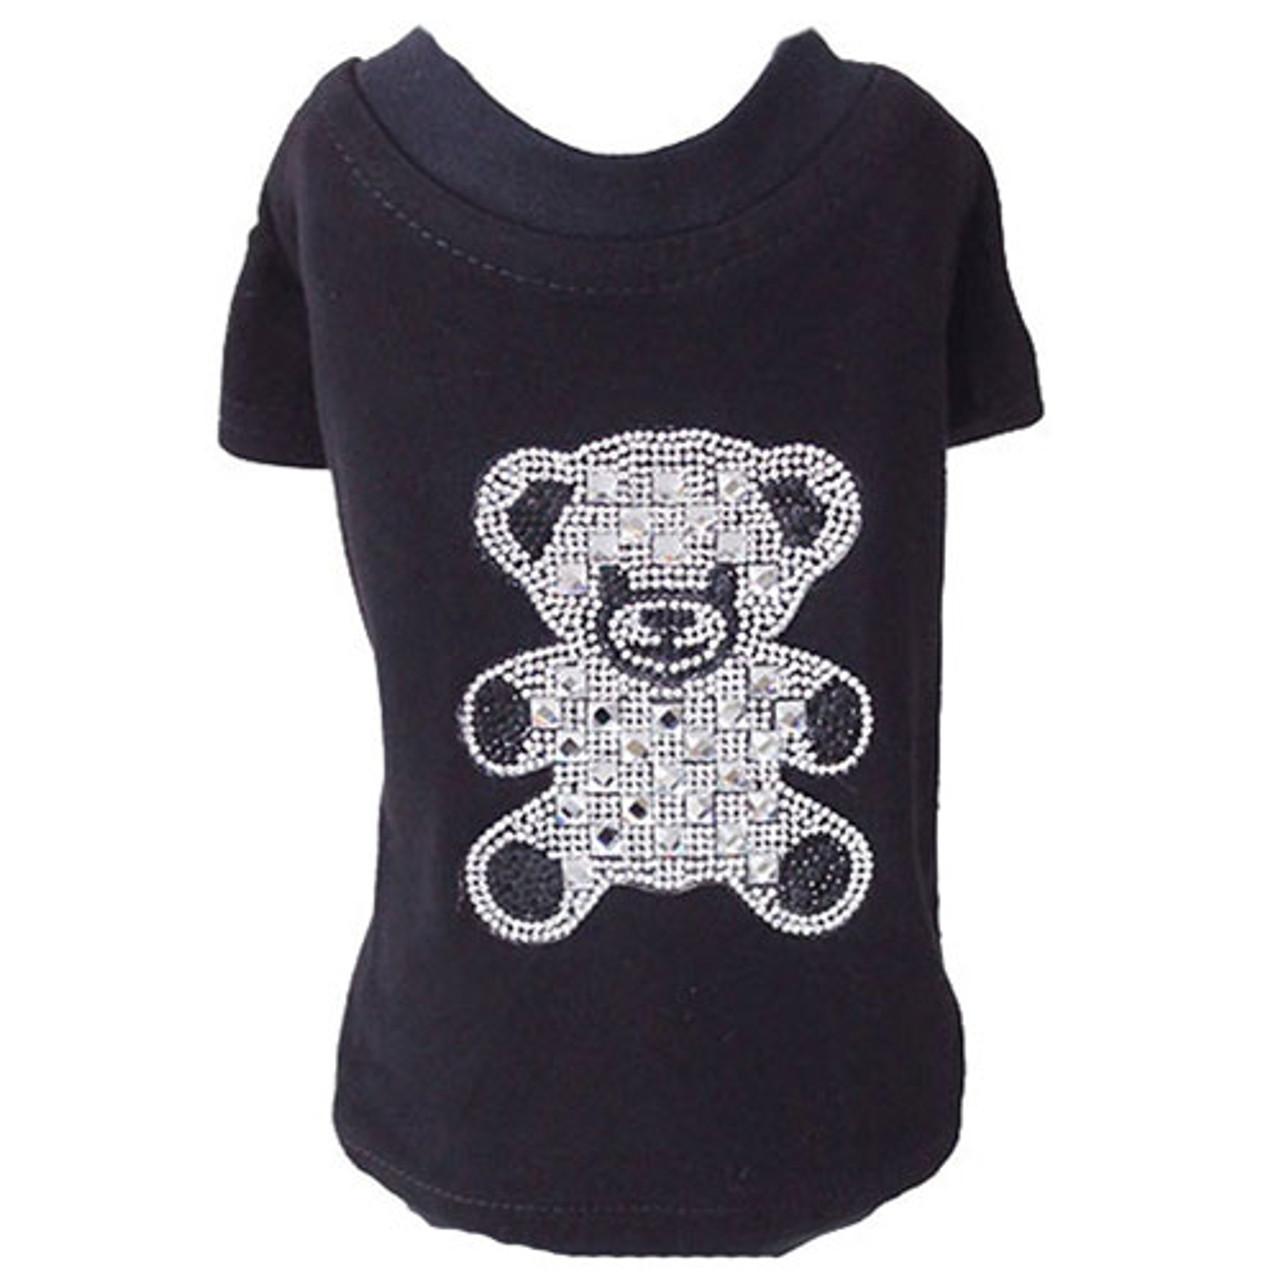 Teddy Bear Rhinestone Tank Black Puppy Kisses